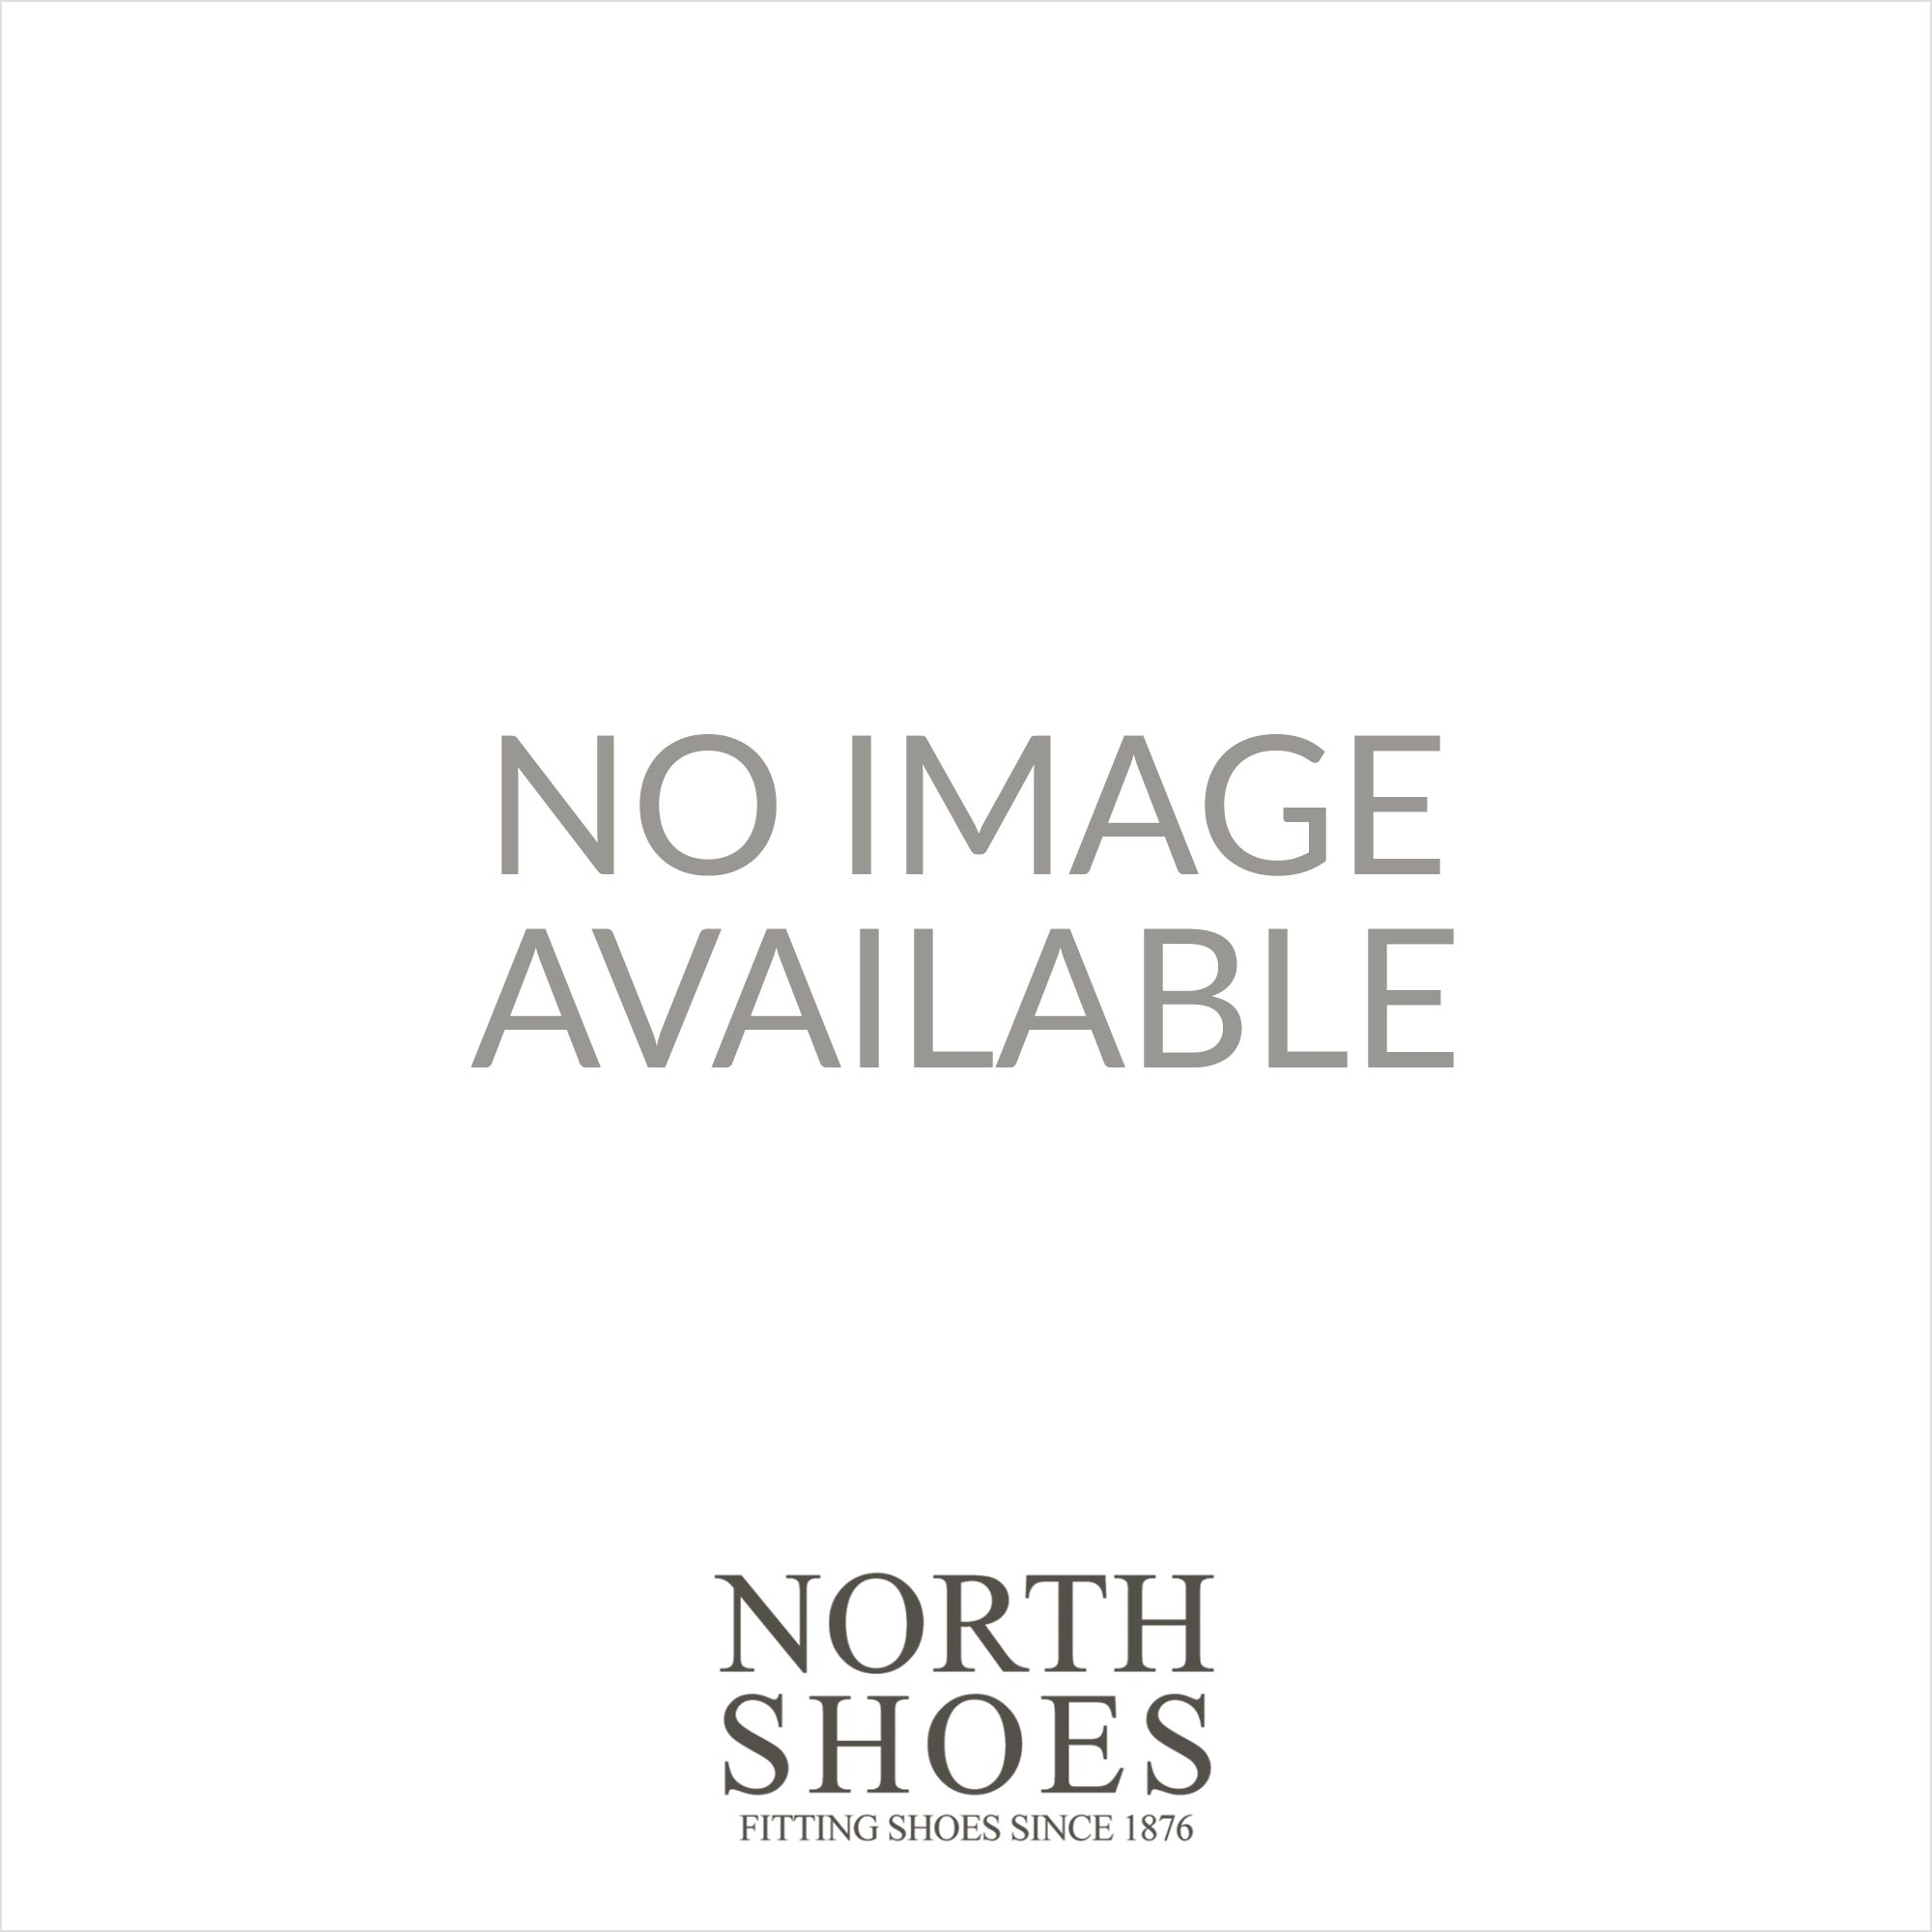 Witcombe Echo Black Nubuck Leather Womens Lace Up Brogue Shoe